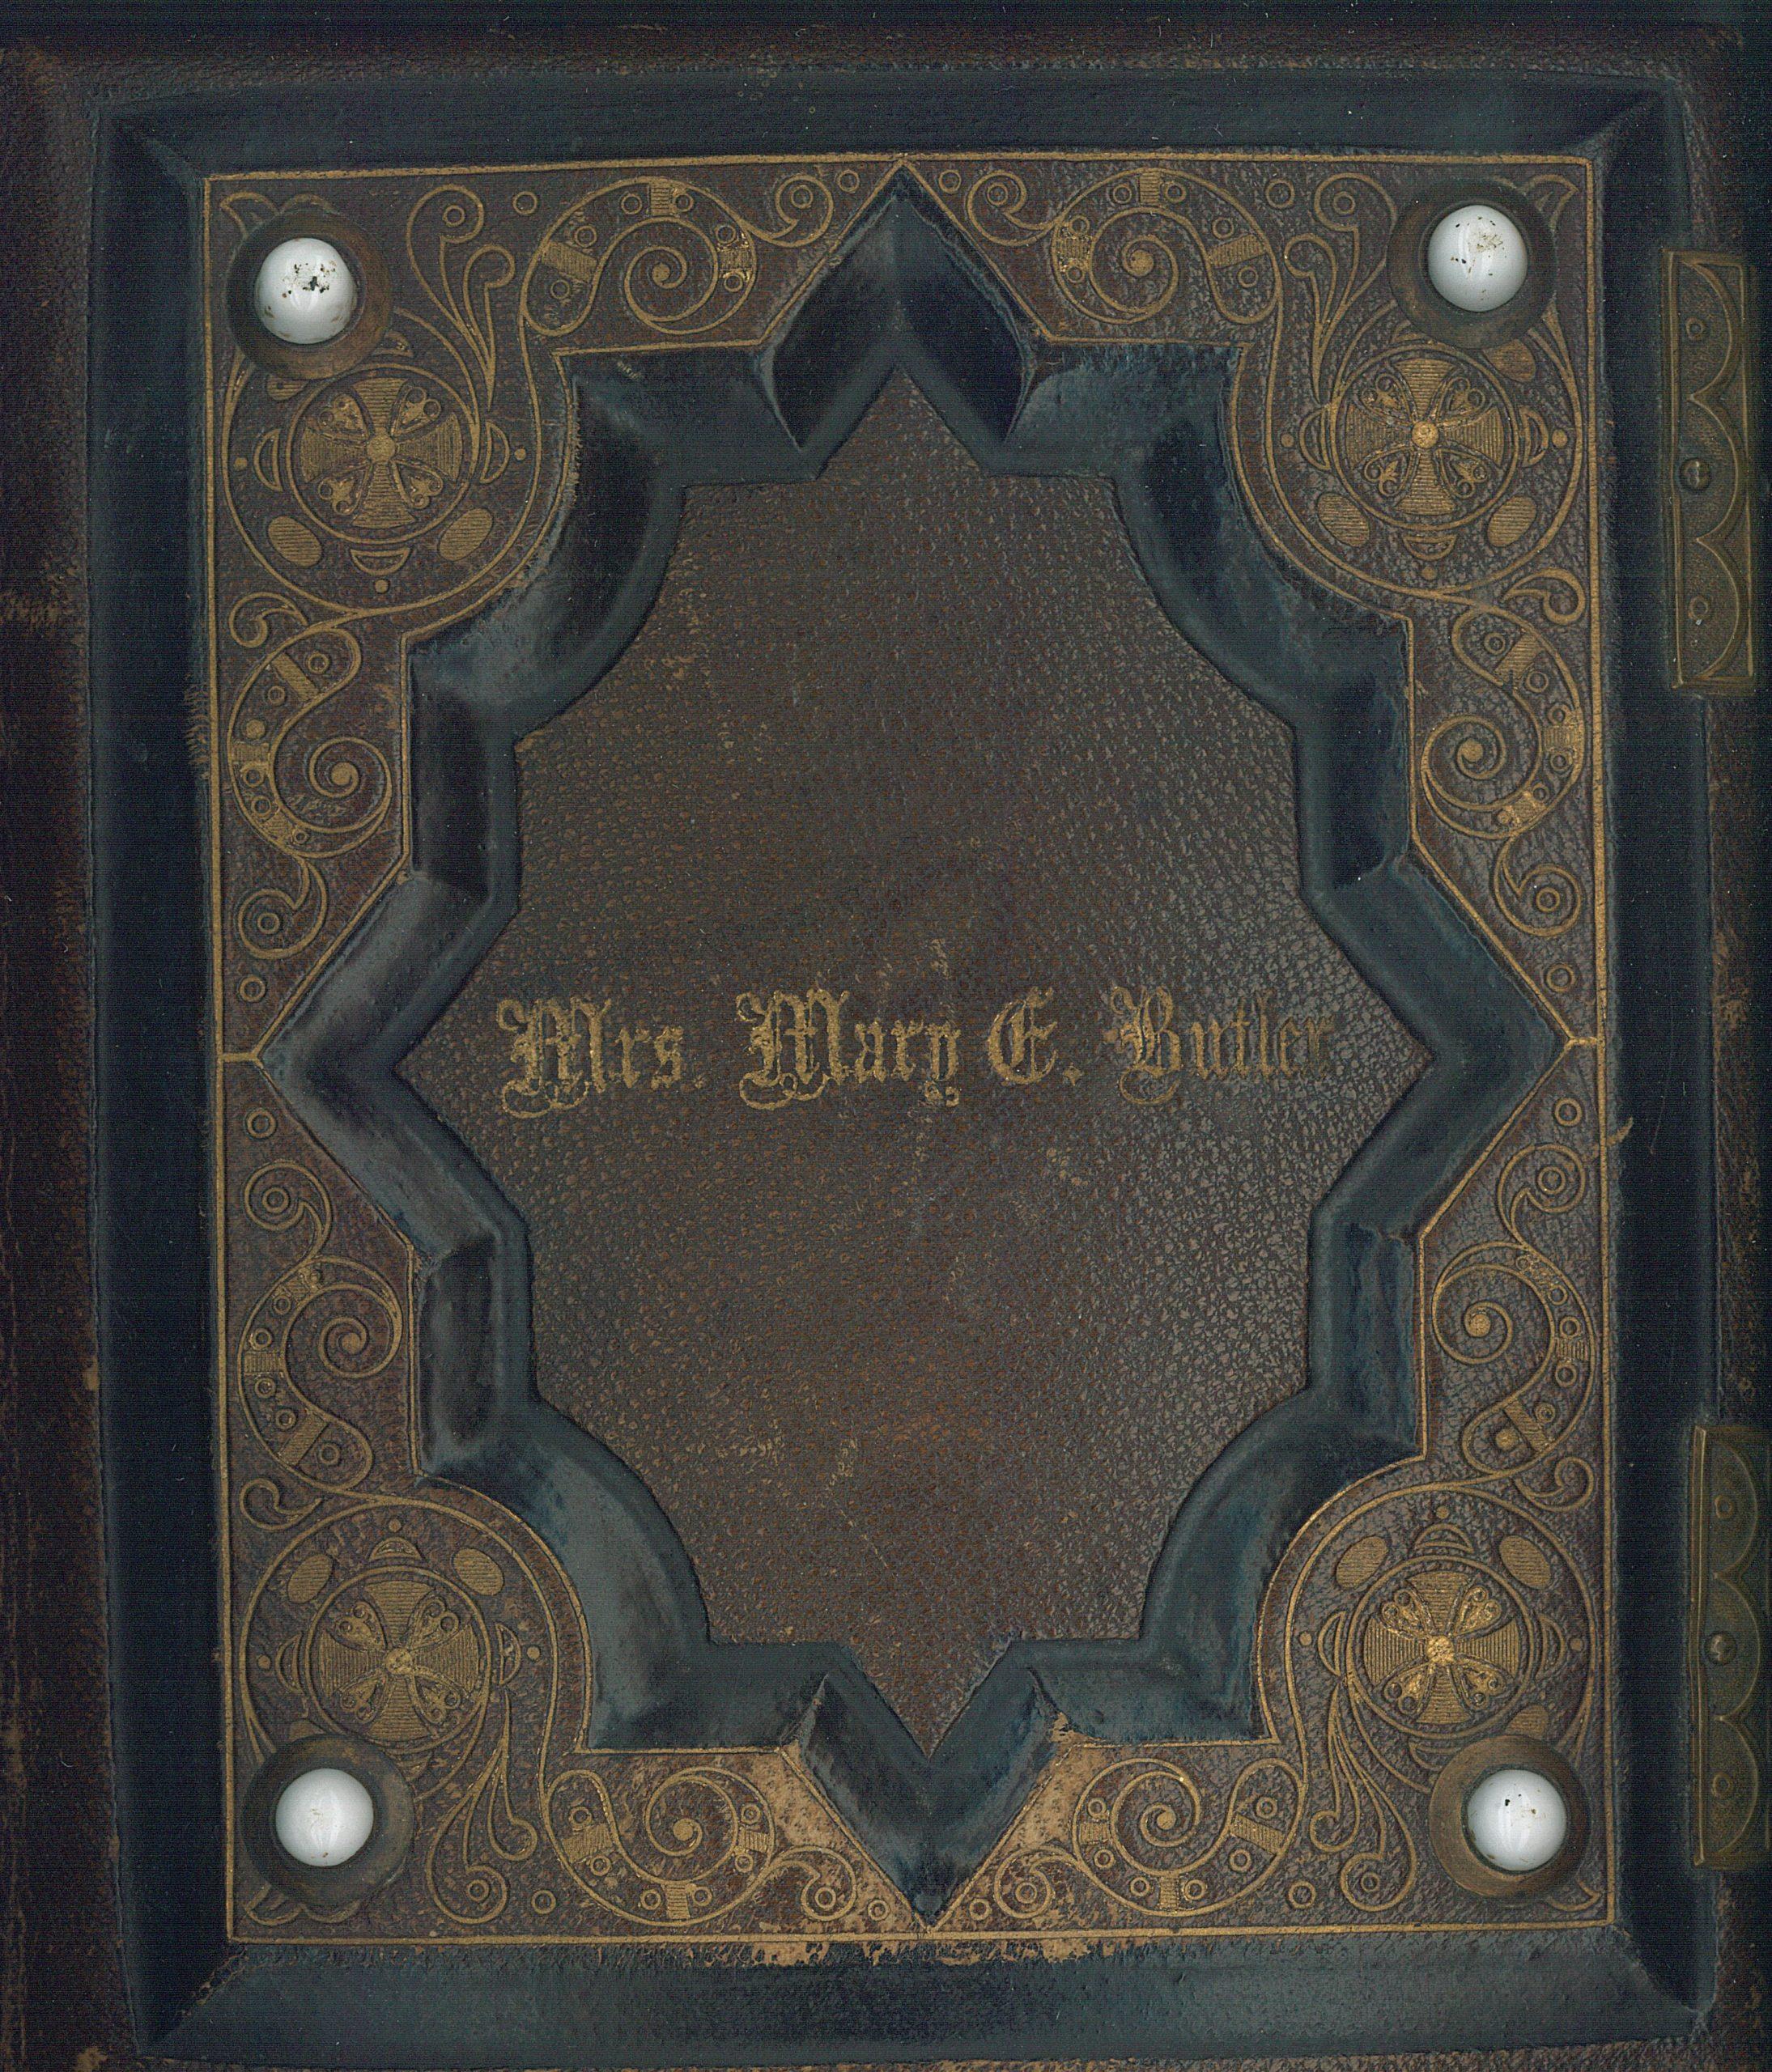 Mary E. Butler's photo album, MCHS collections, #1996.34.2.